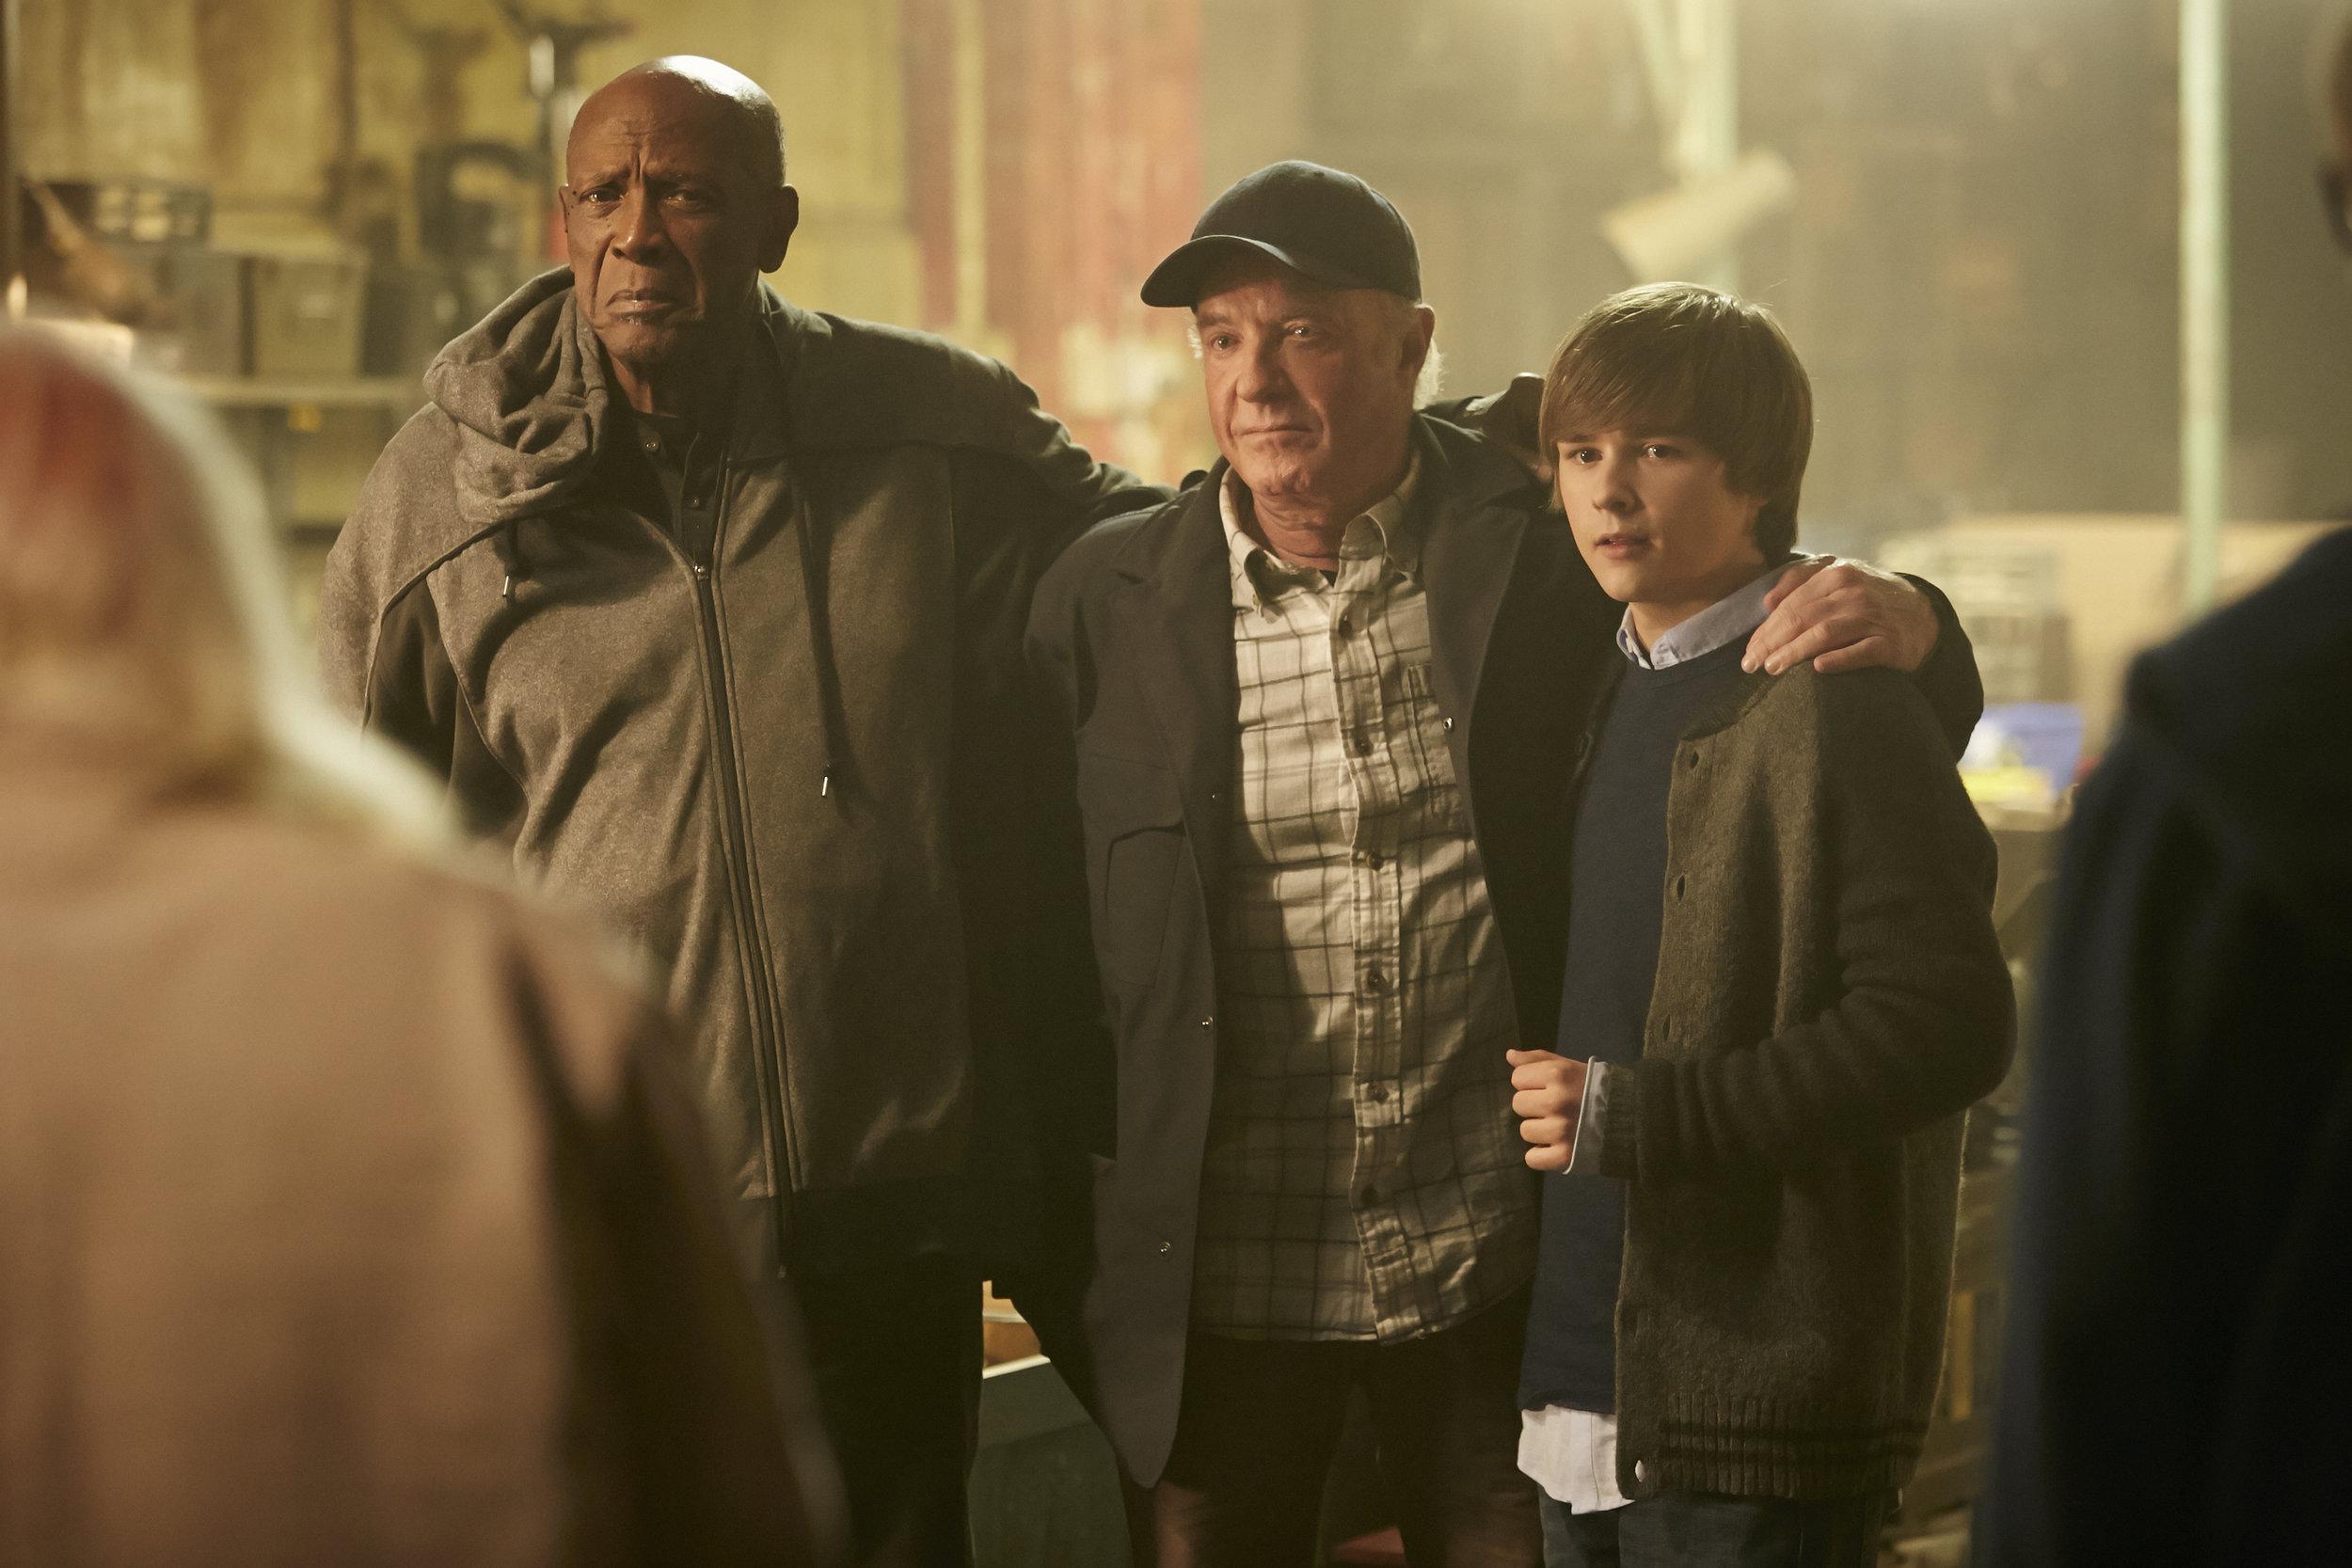 Lou Gossett Jr., James Caan and Dylan Everett in Undercover Grandpa